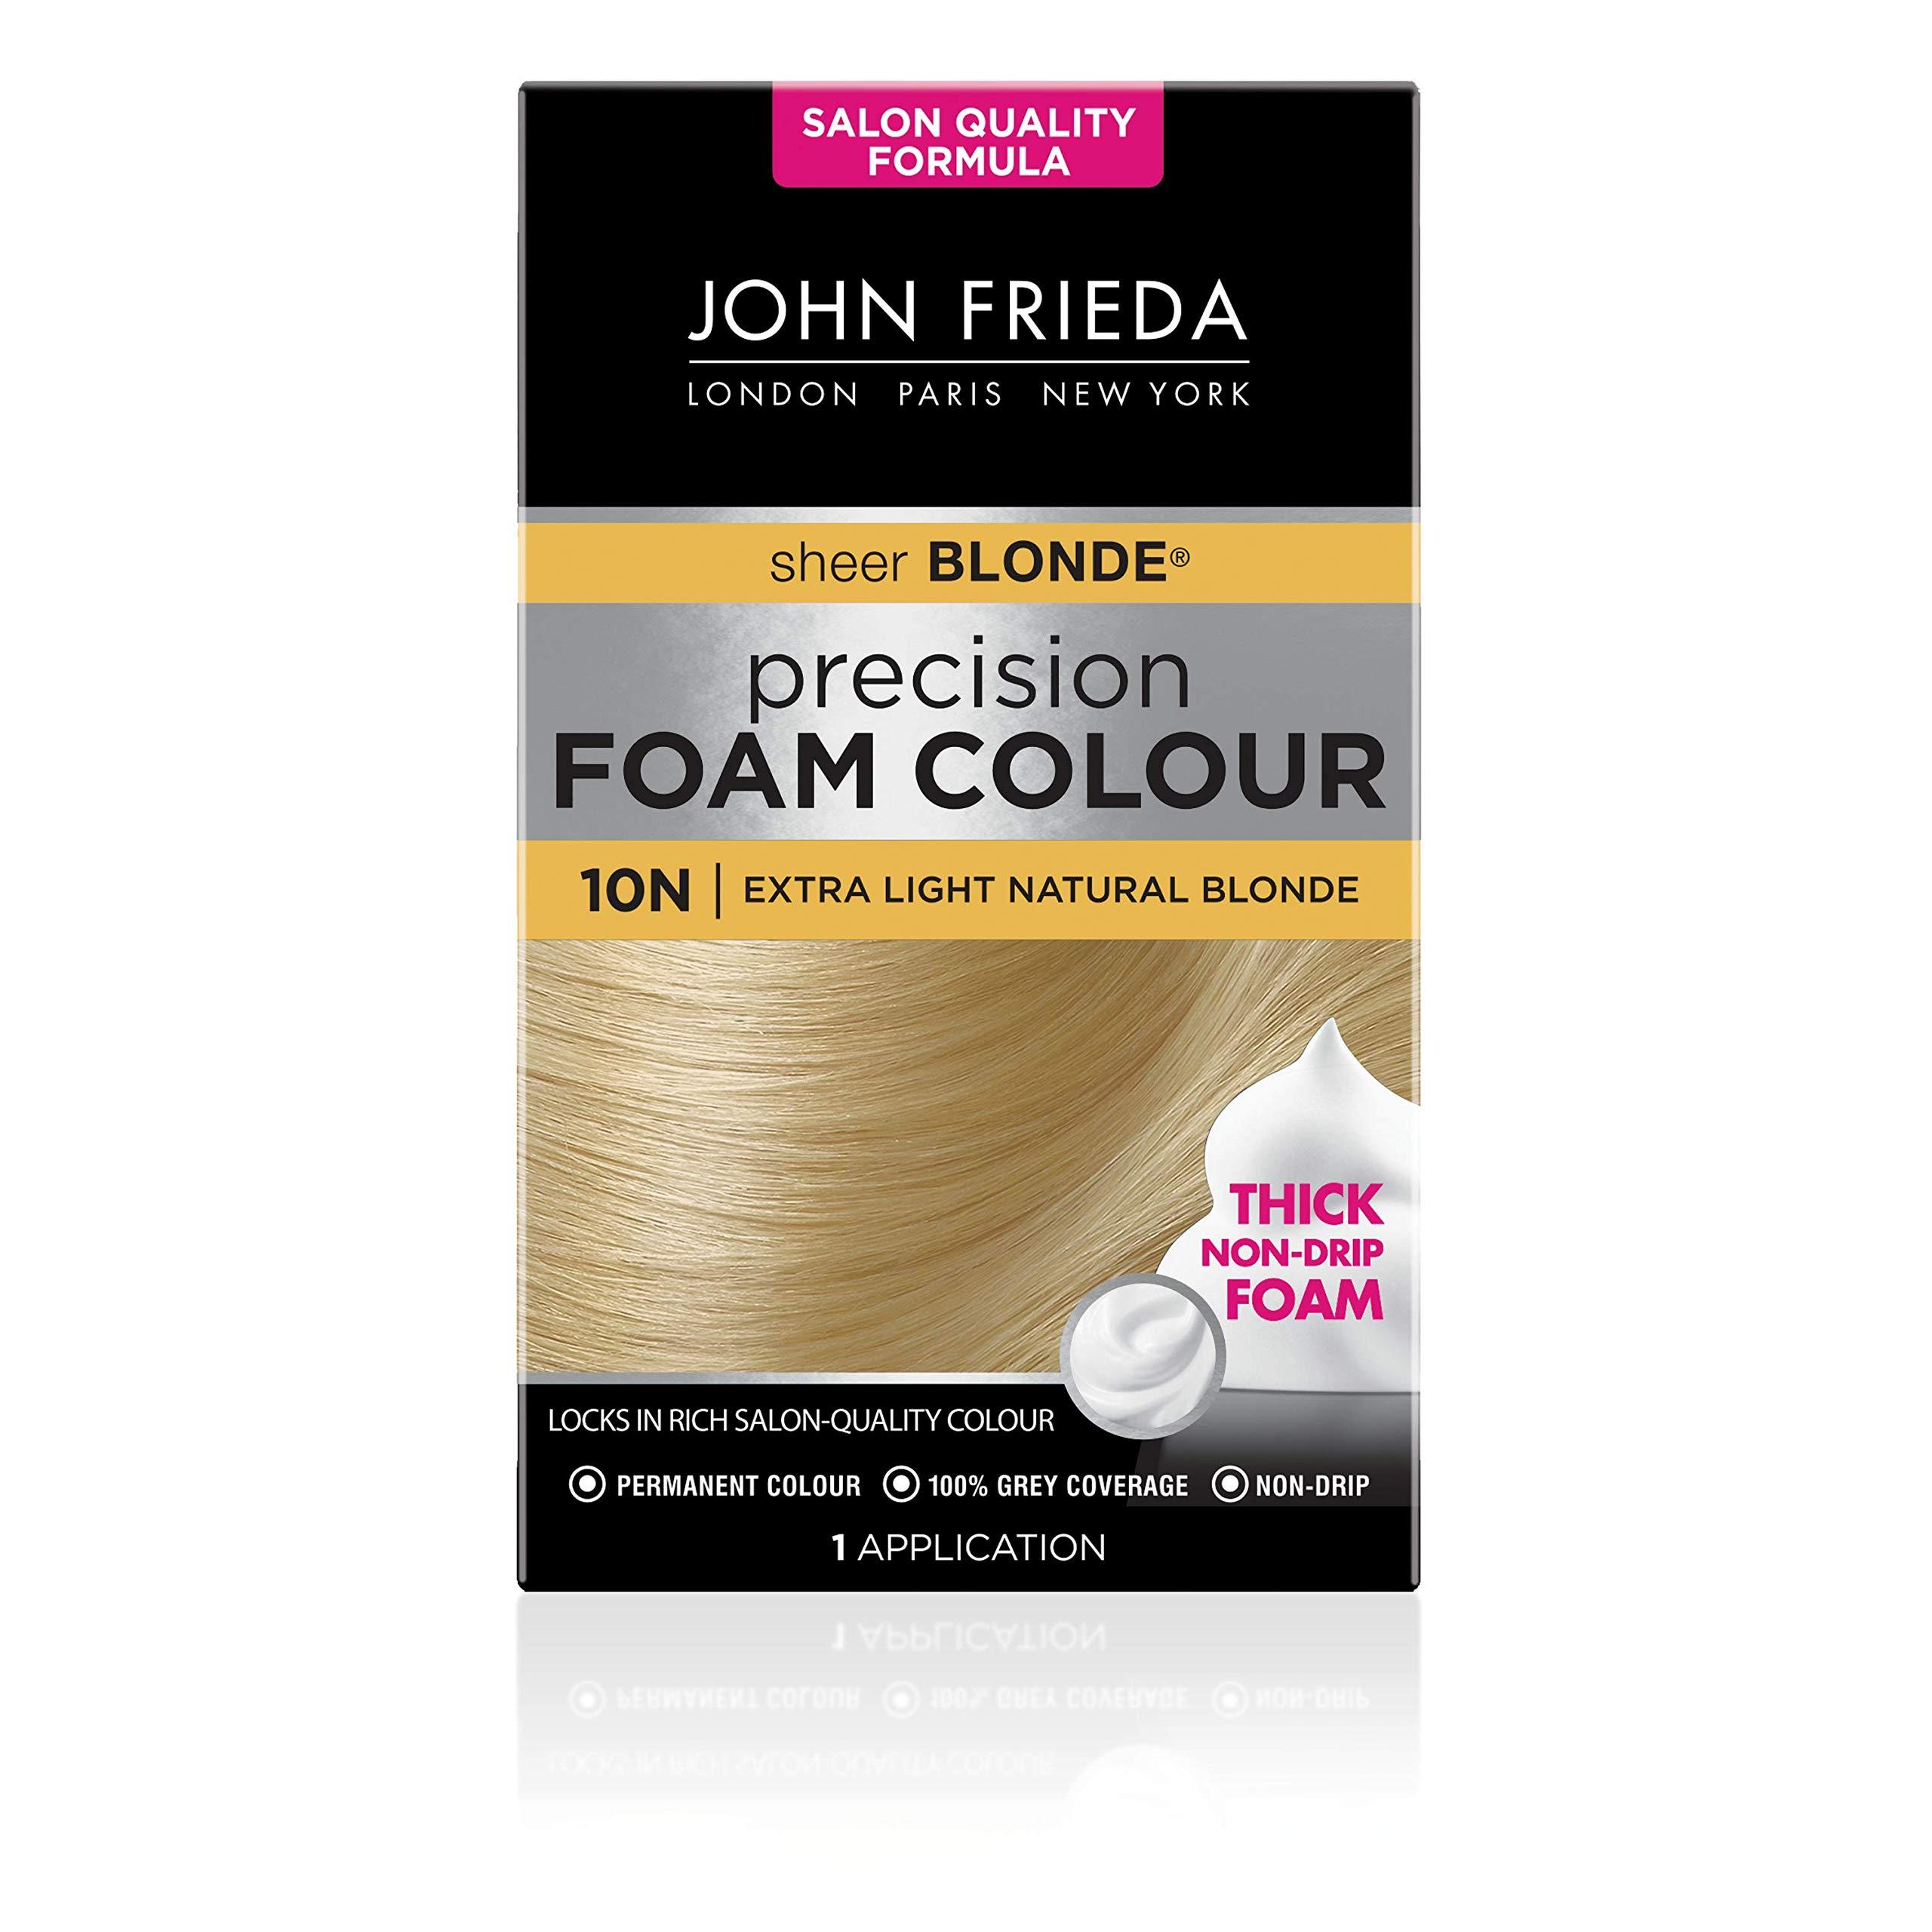 John Frieda Precision Foam Colour Permanent Hair Dye, Number 10N, Extra Light Natural Blonde